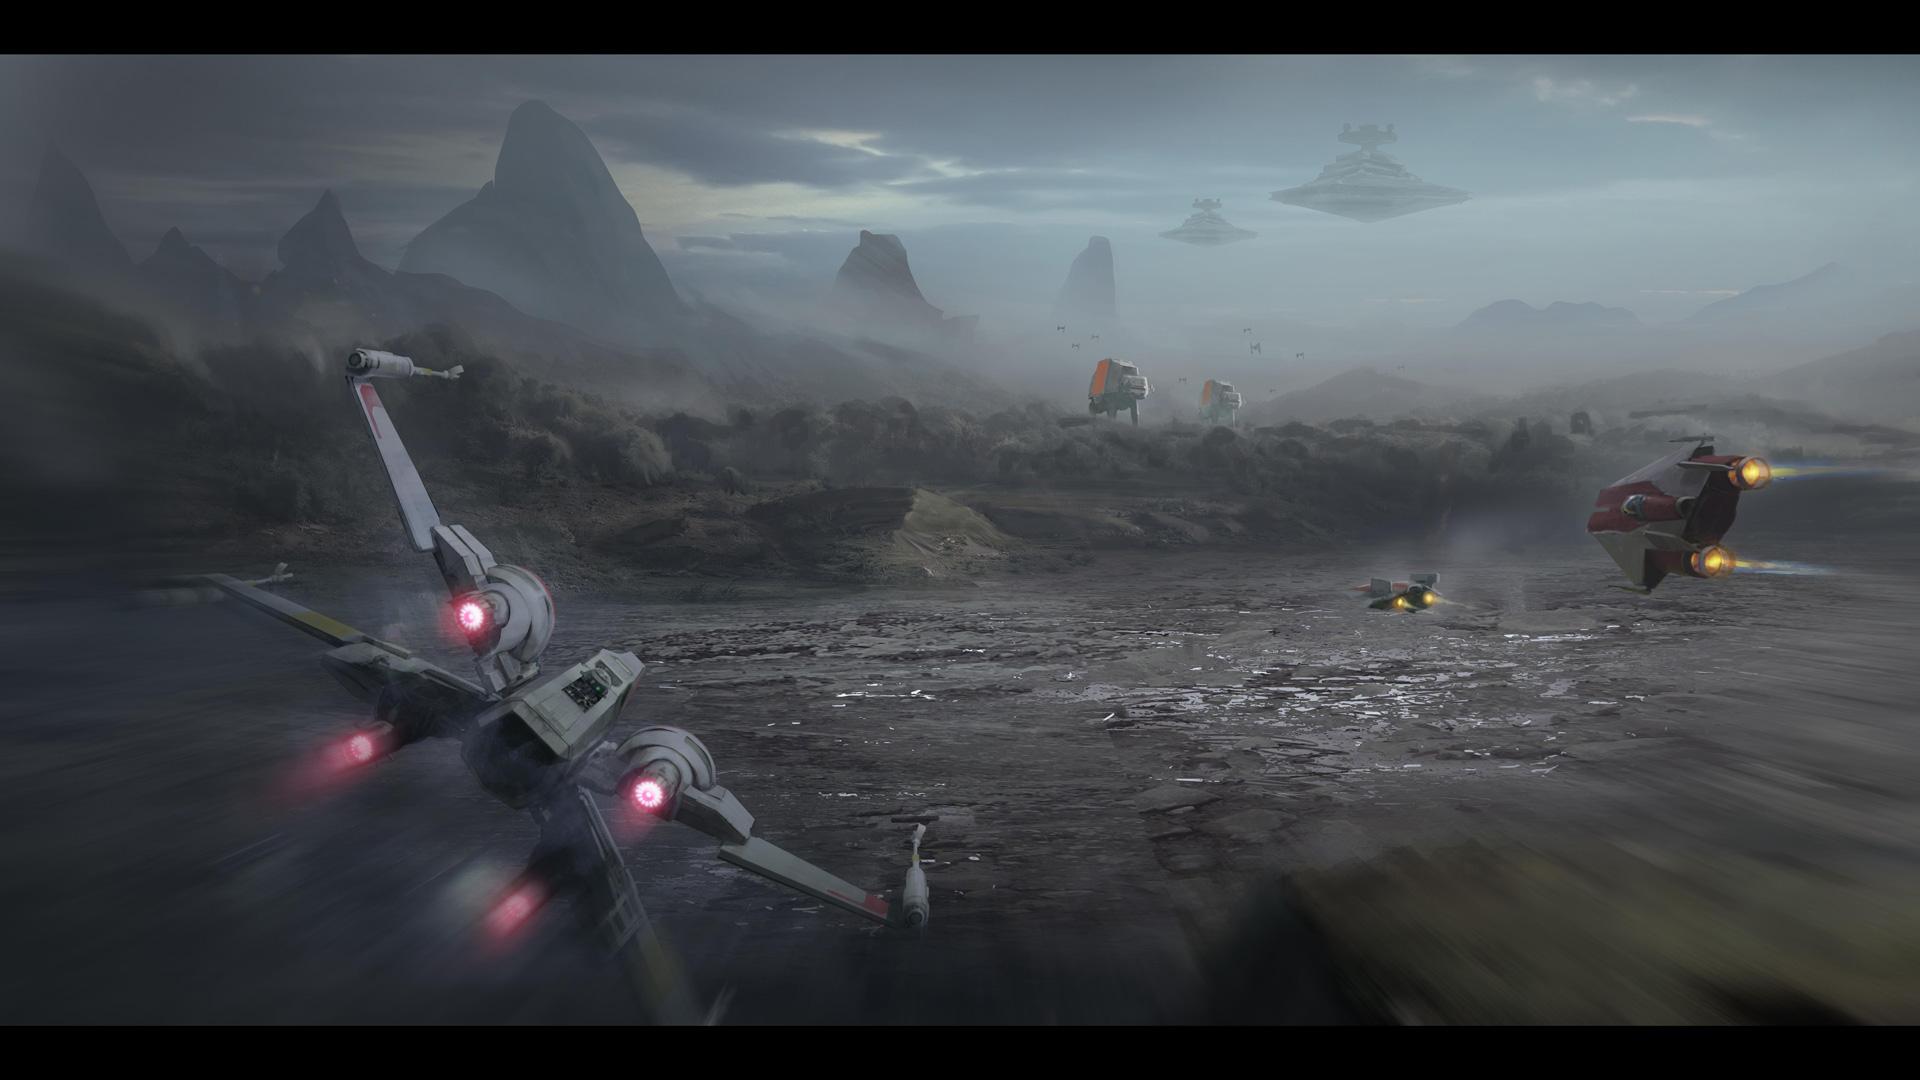 star-wars_genericBG_concept_v002_bugged.jpg